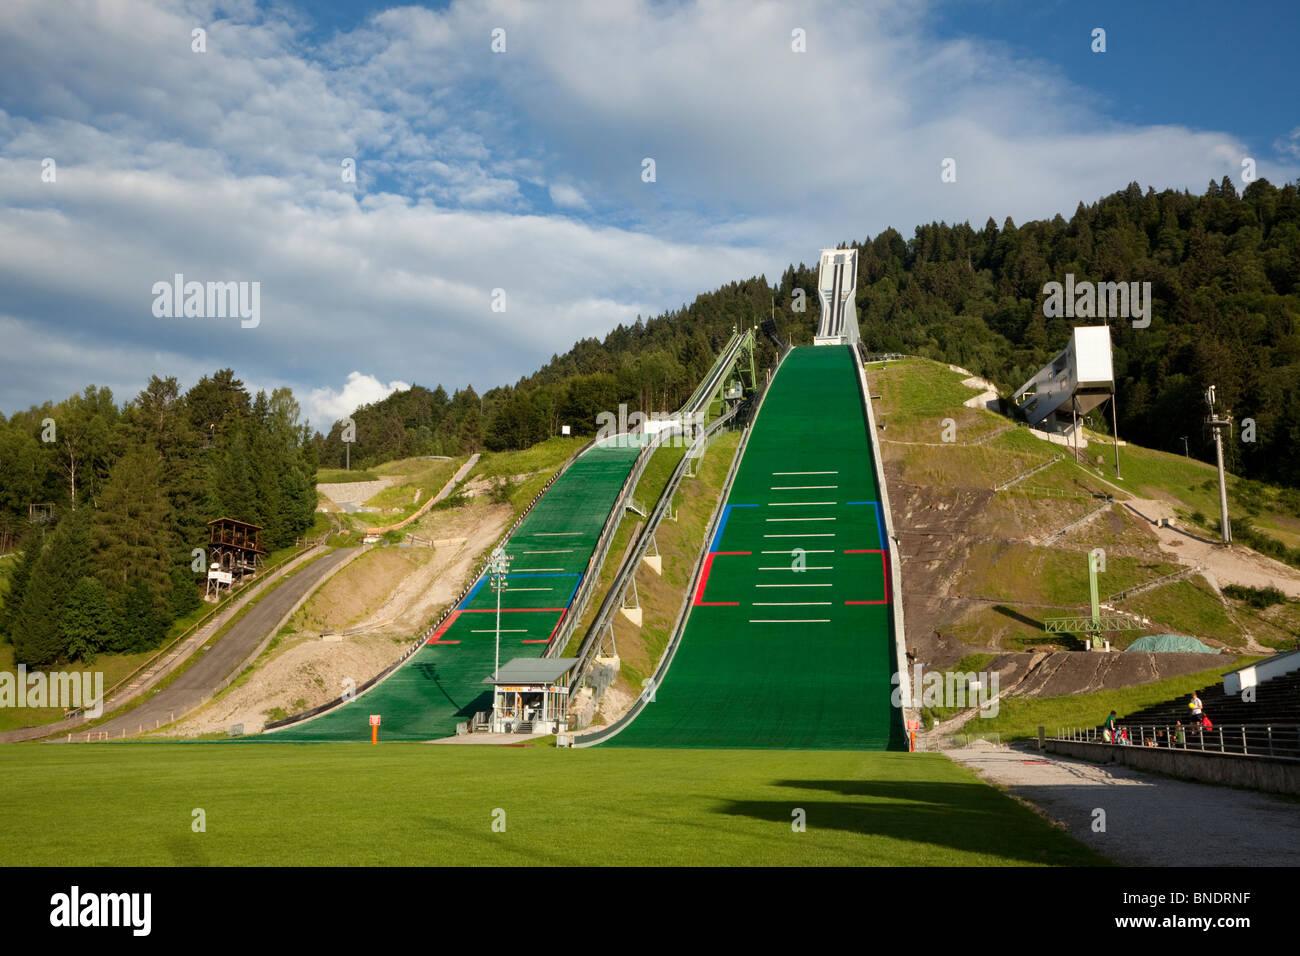 Site of 1936 winter Olympics, ski jumps in Garmisch ...